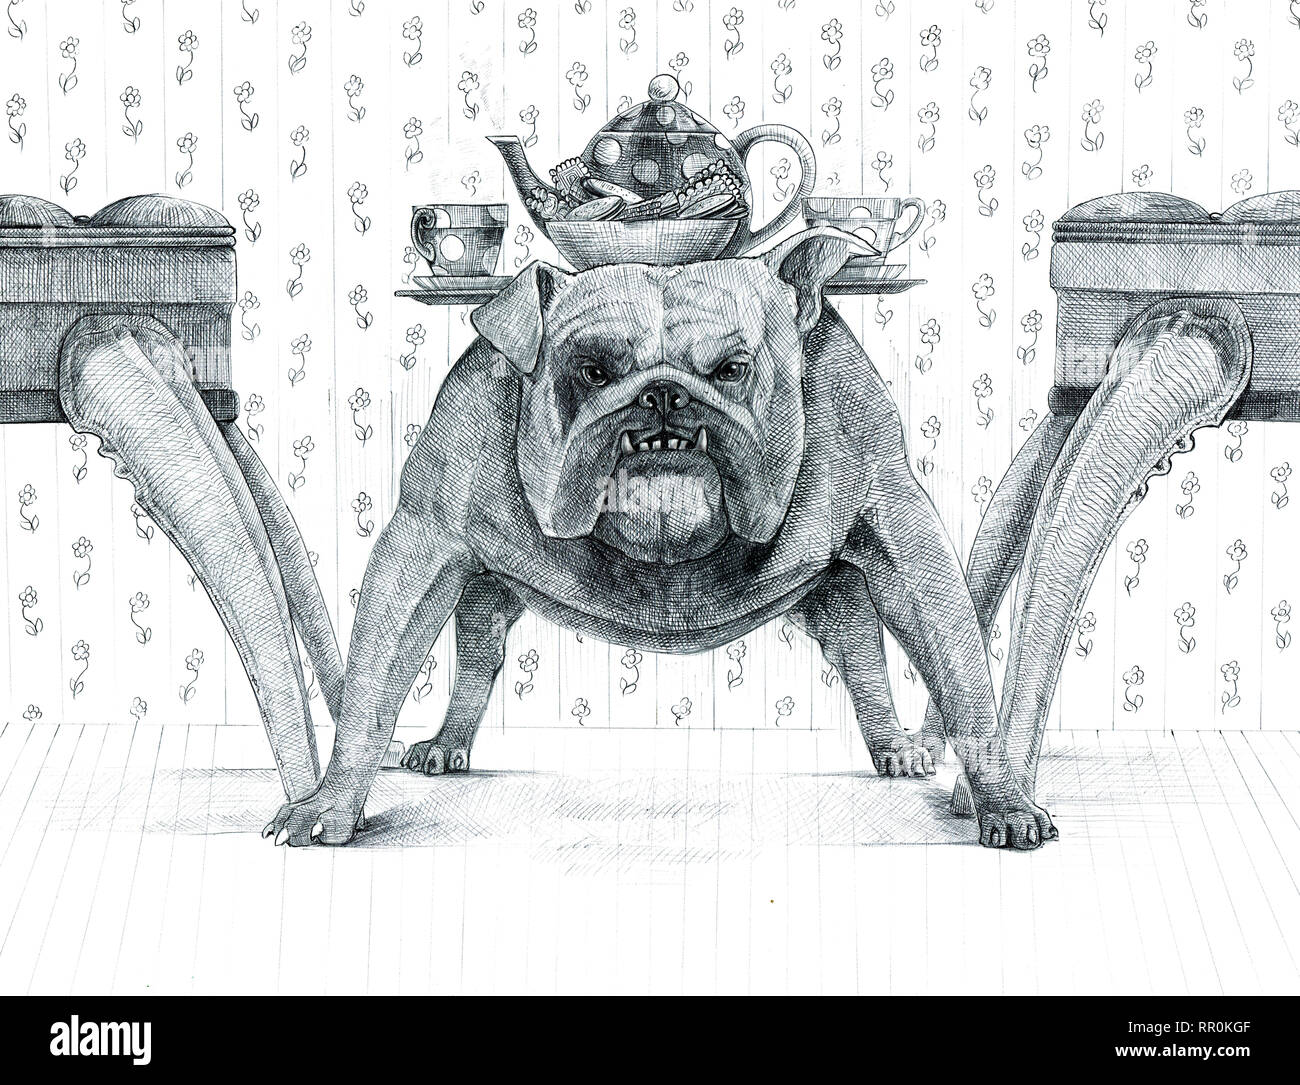 Coloriage Bouledogue Anglais.Dog Drawing Photos Dog Drawing Images Alamy